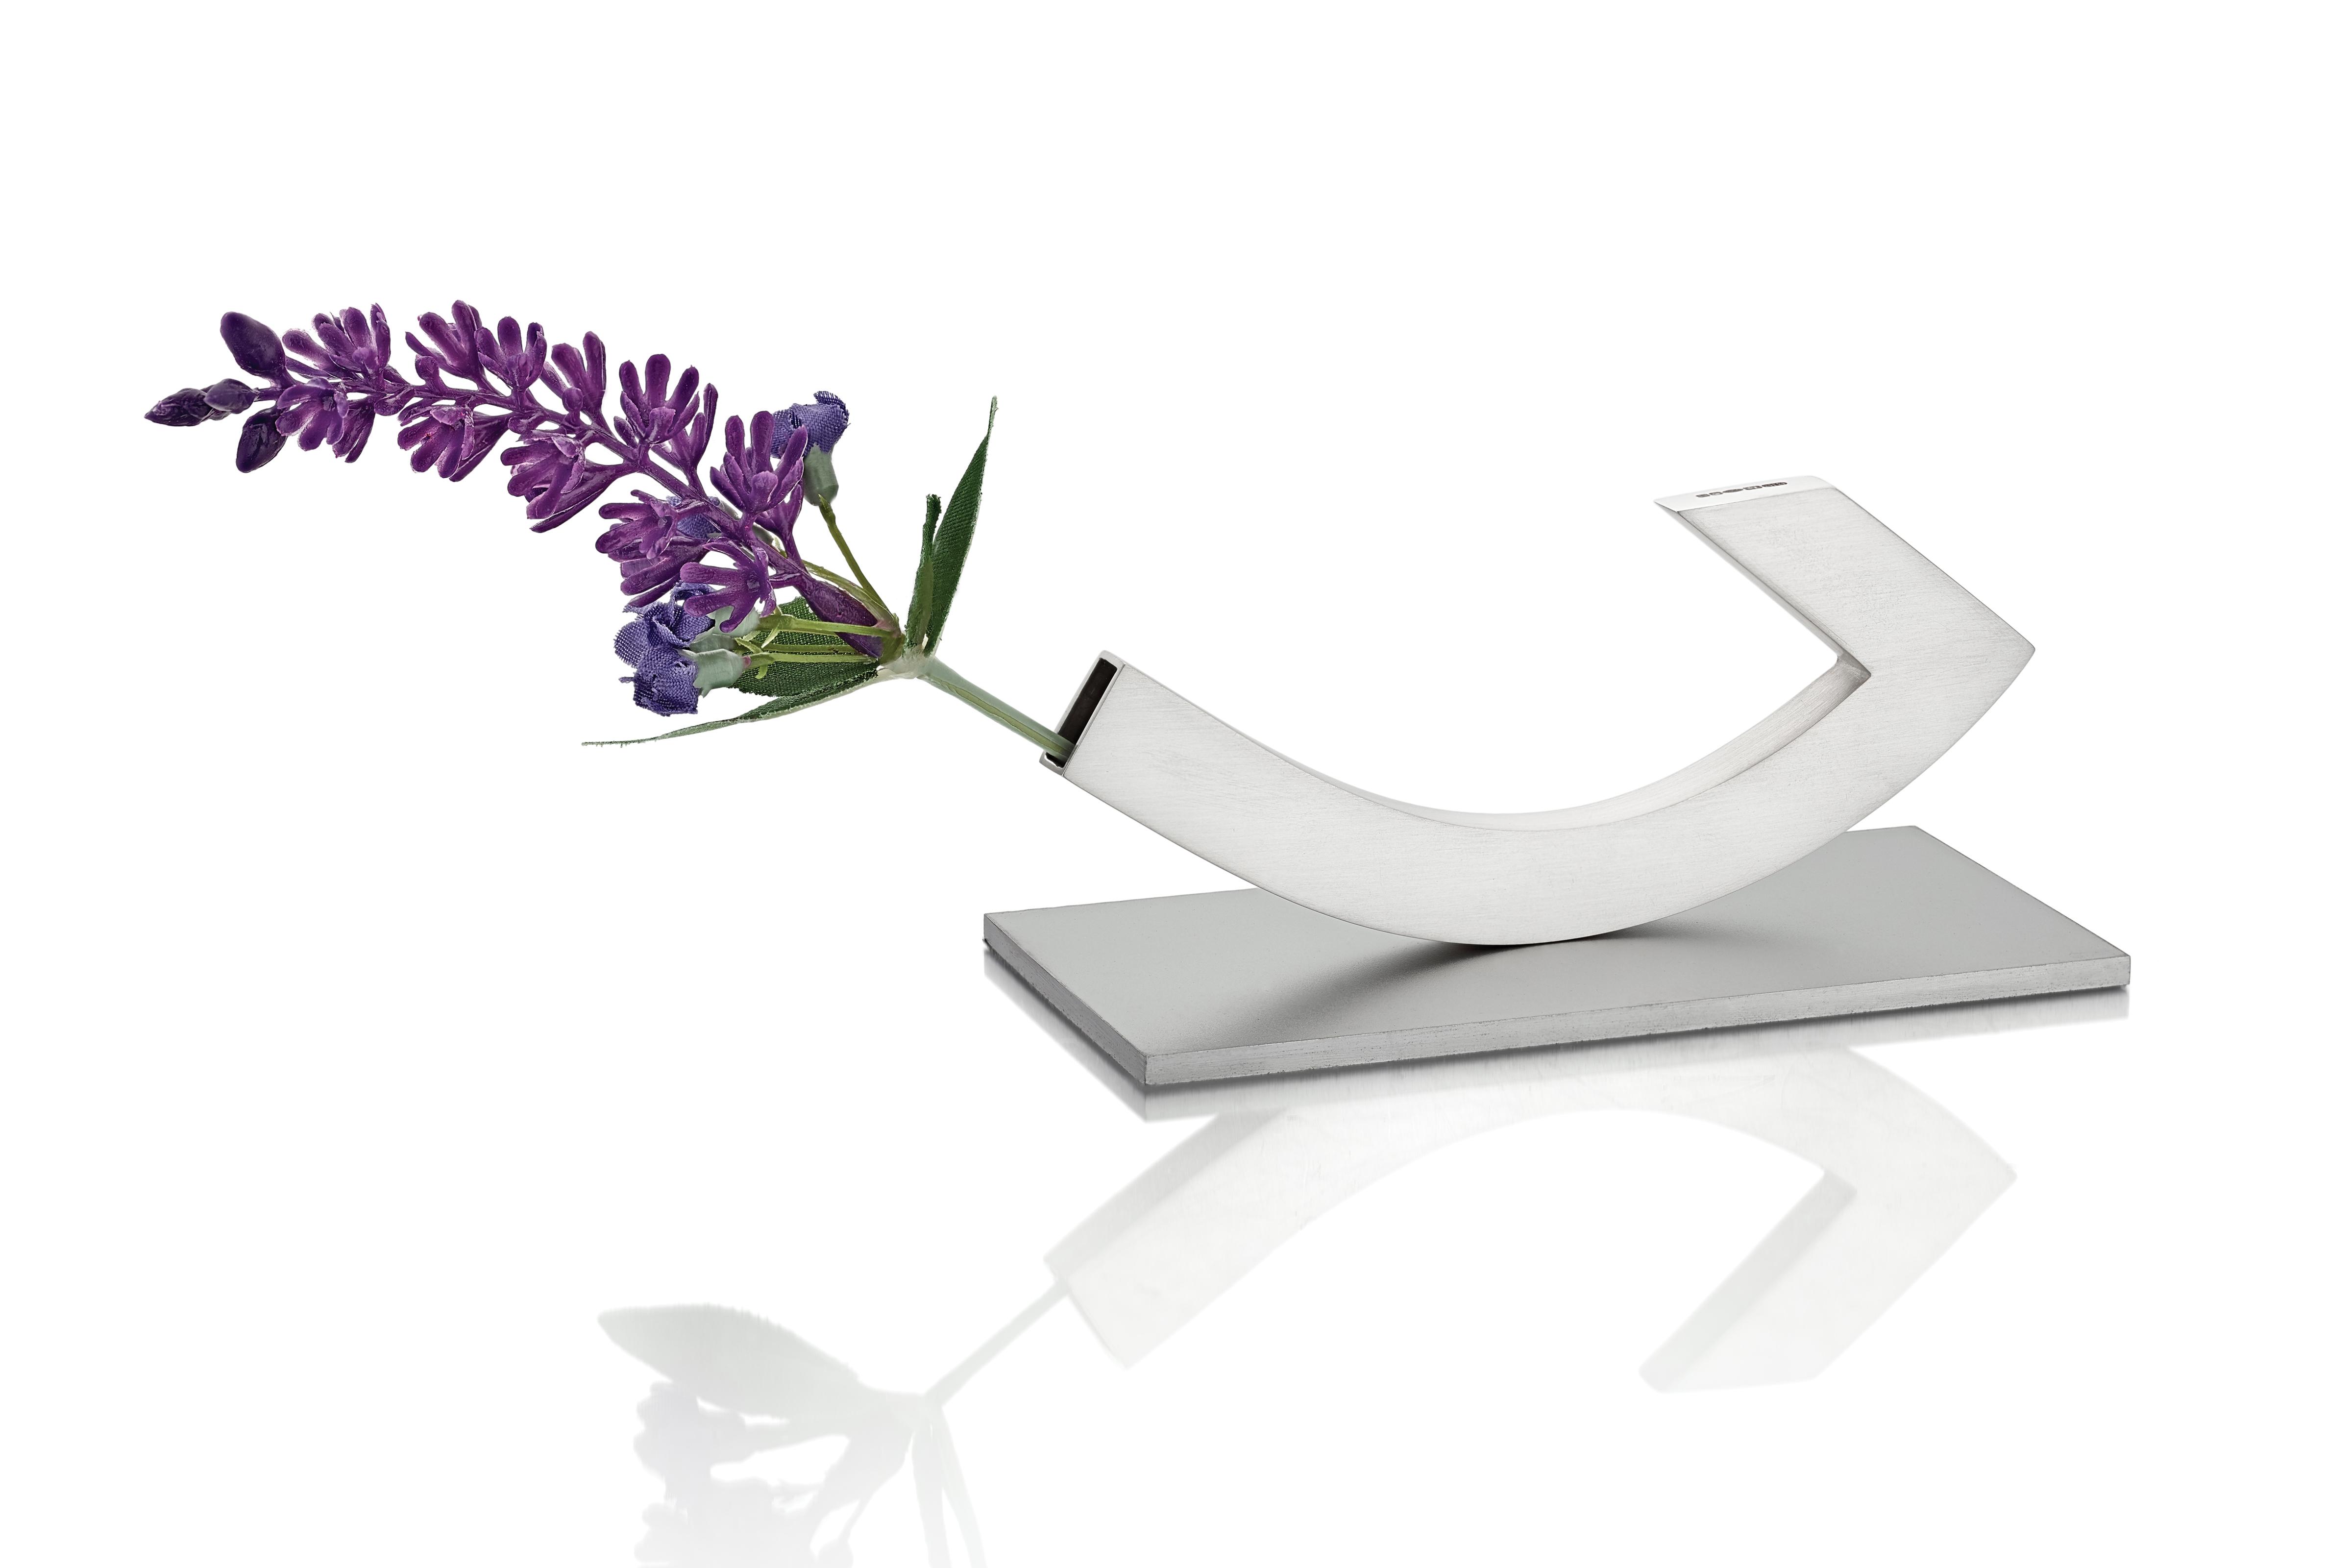 Counter Balance Vase – Copyright BJRdesigns